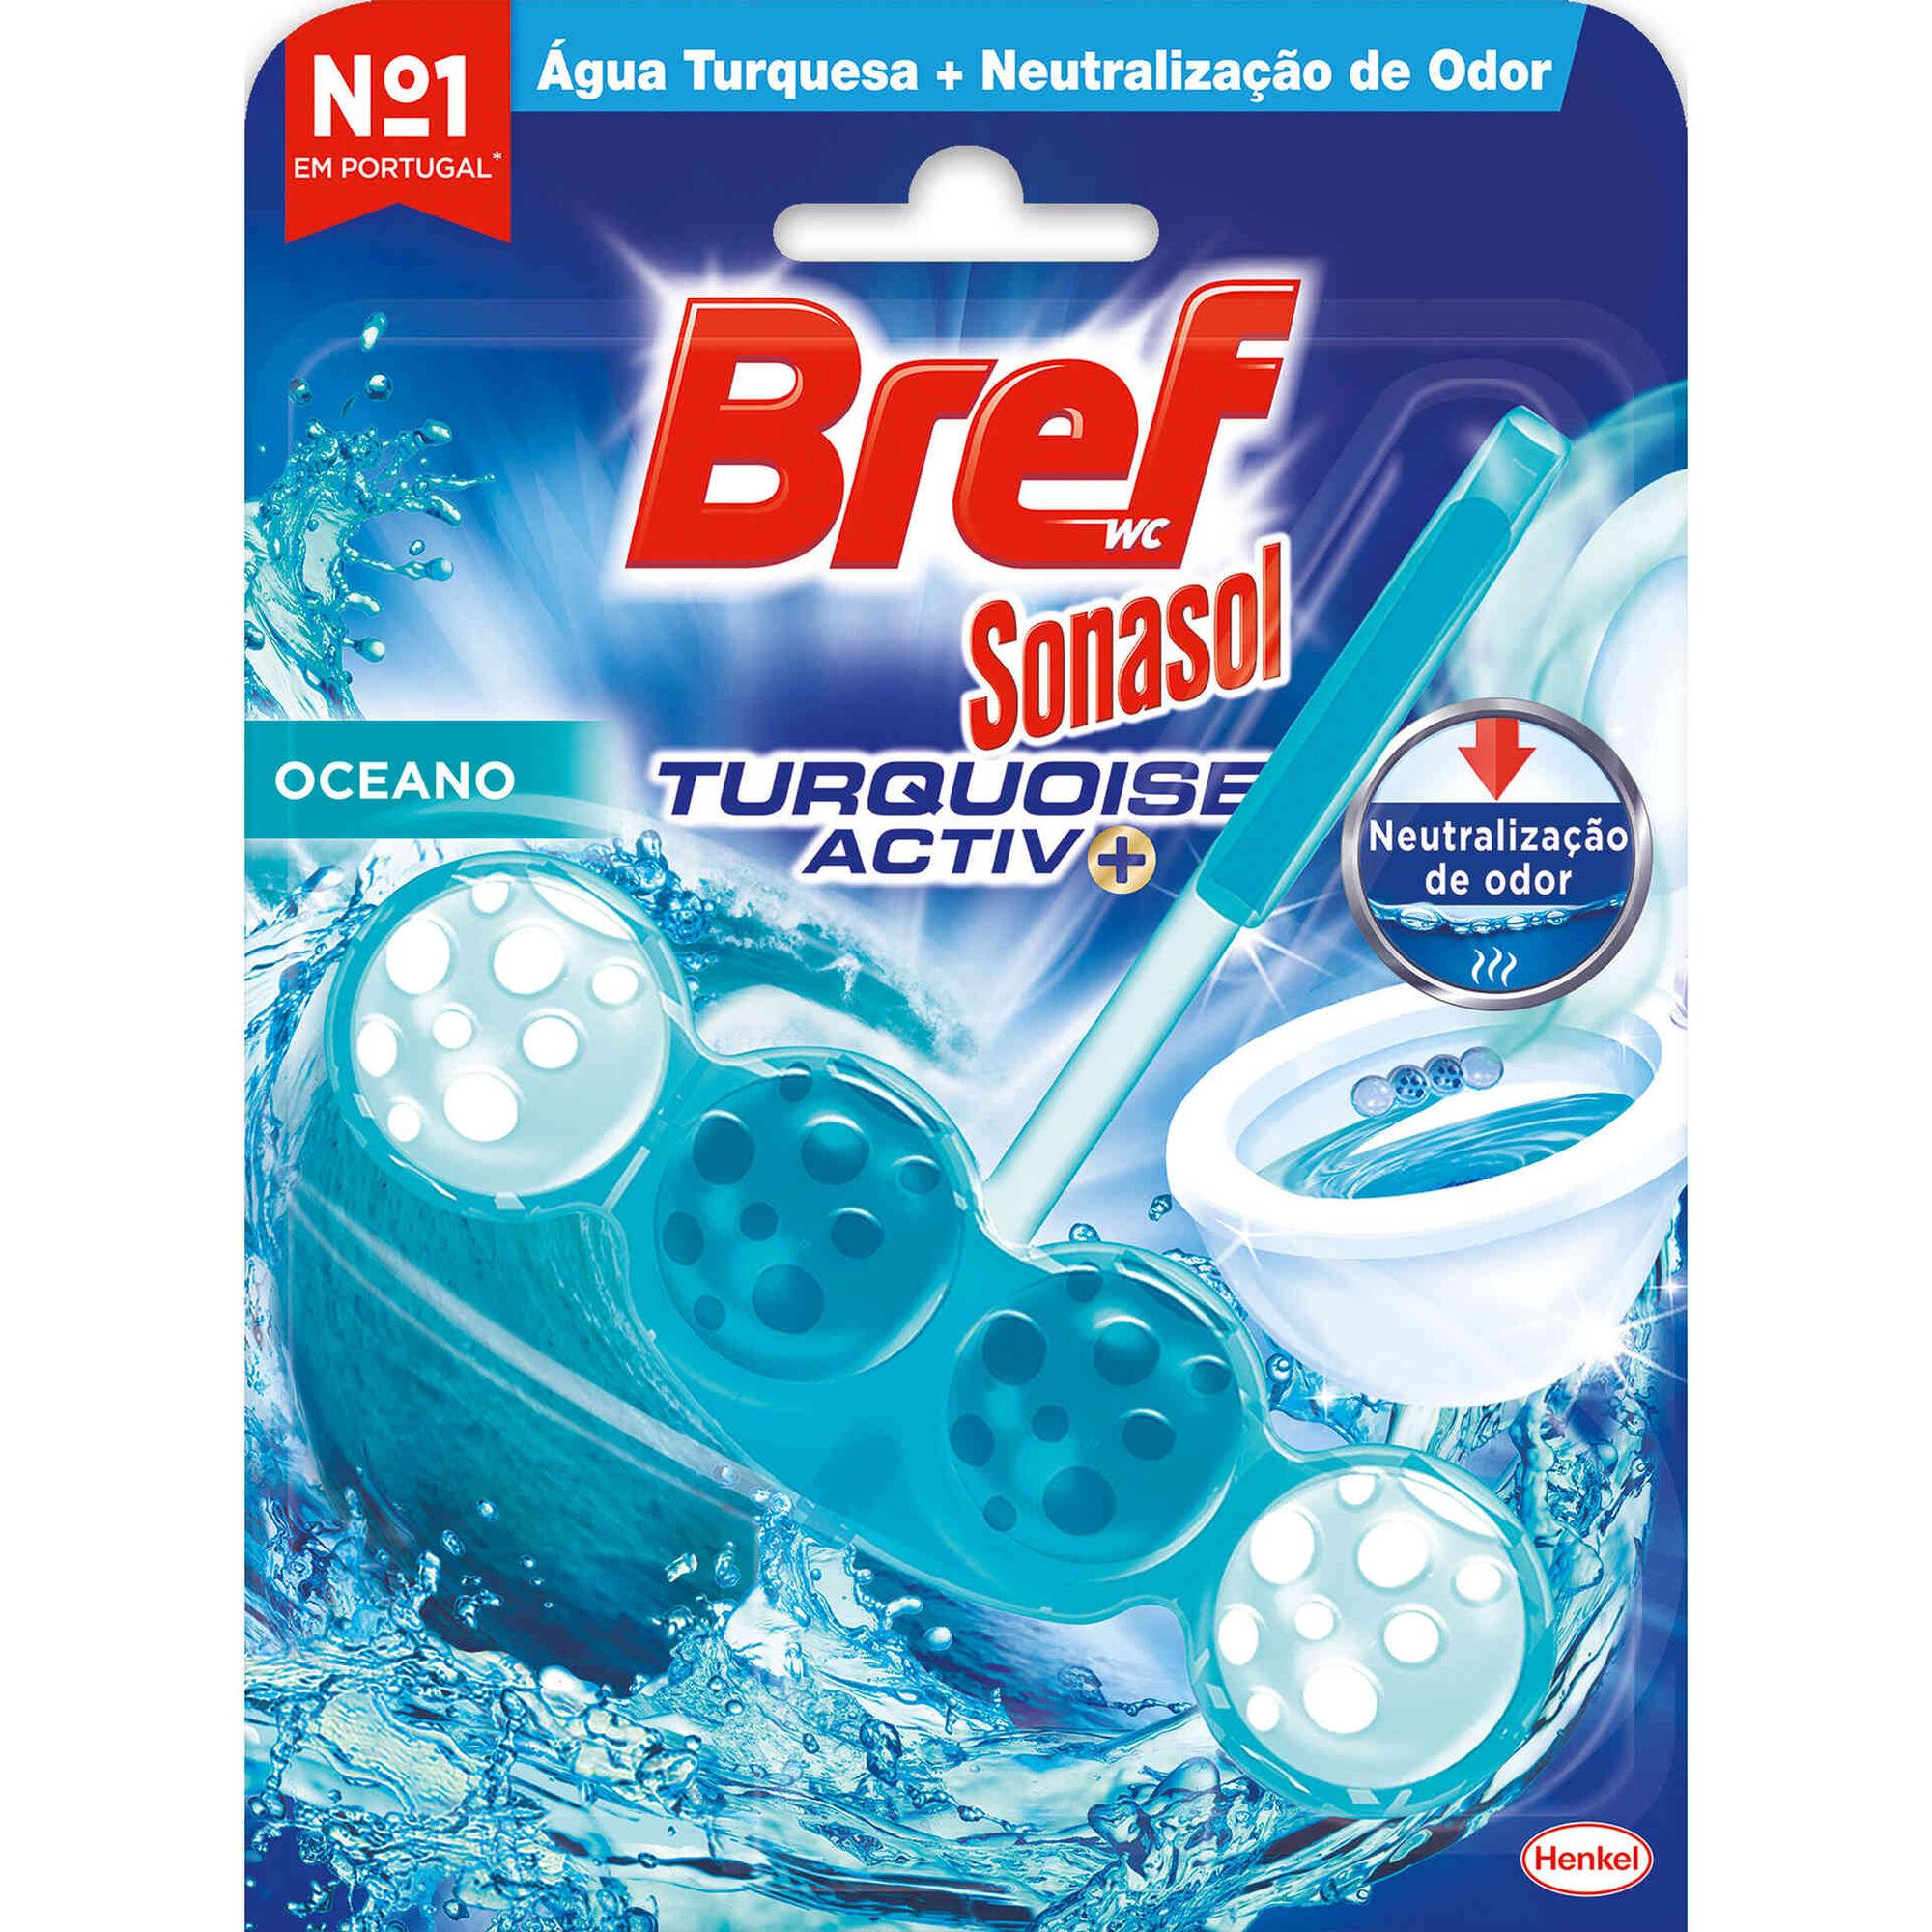 Bloco Sanitário Turquoise Ative+ Oceano